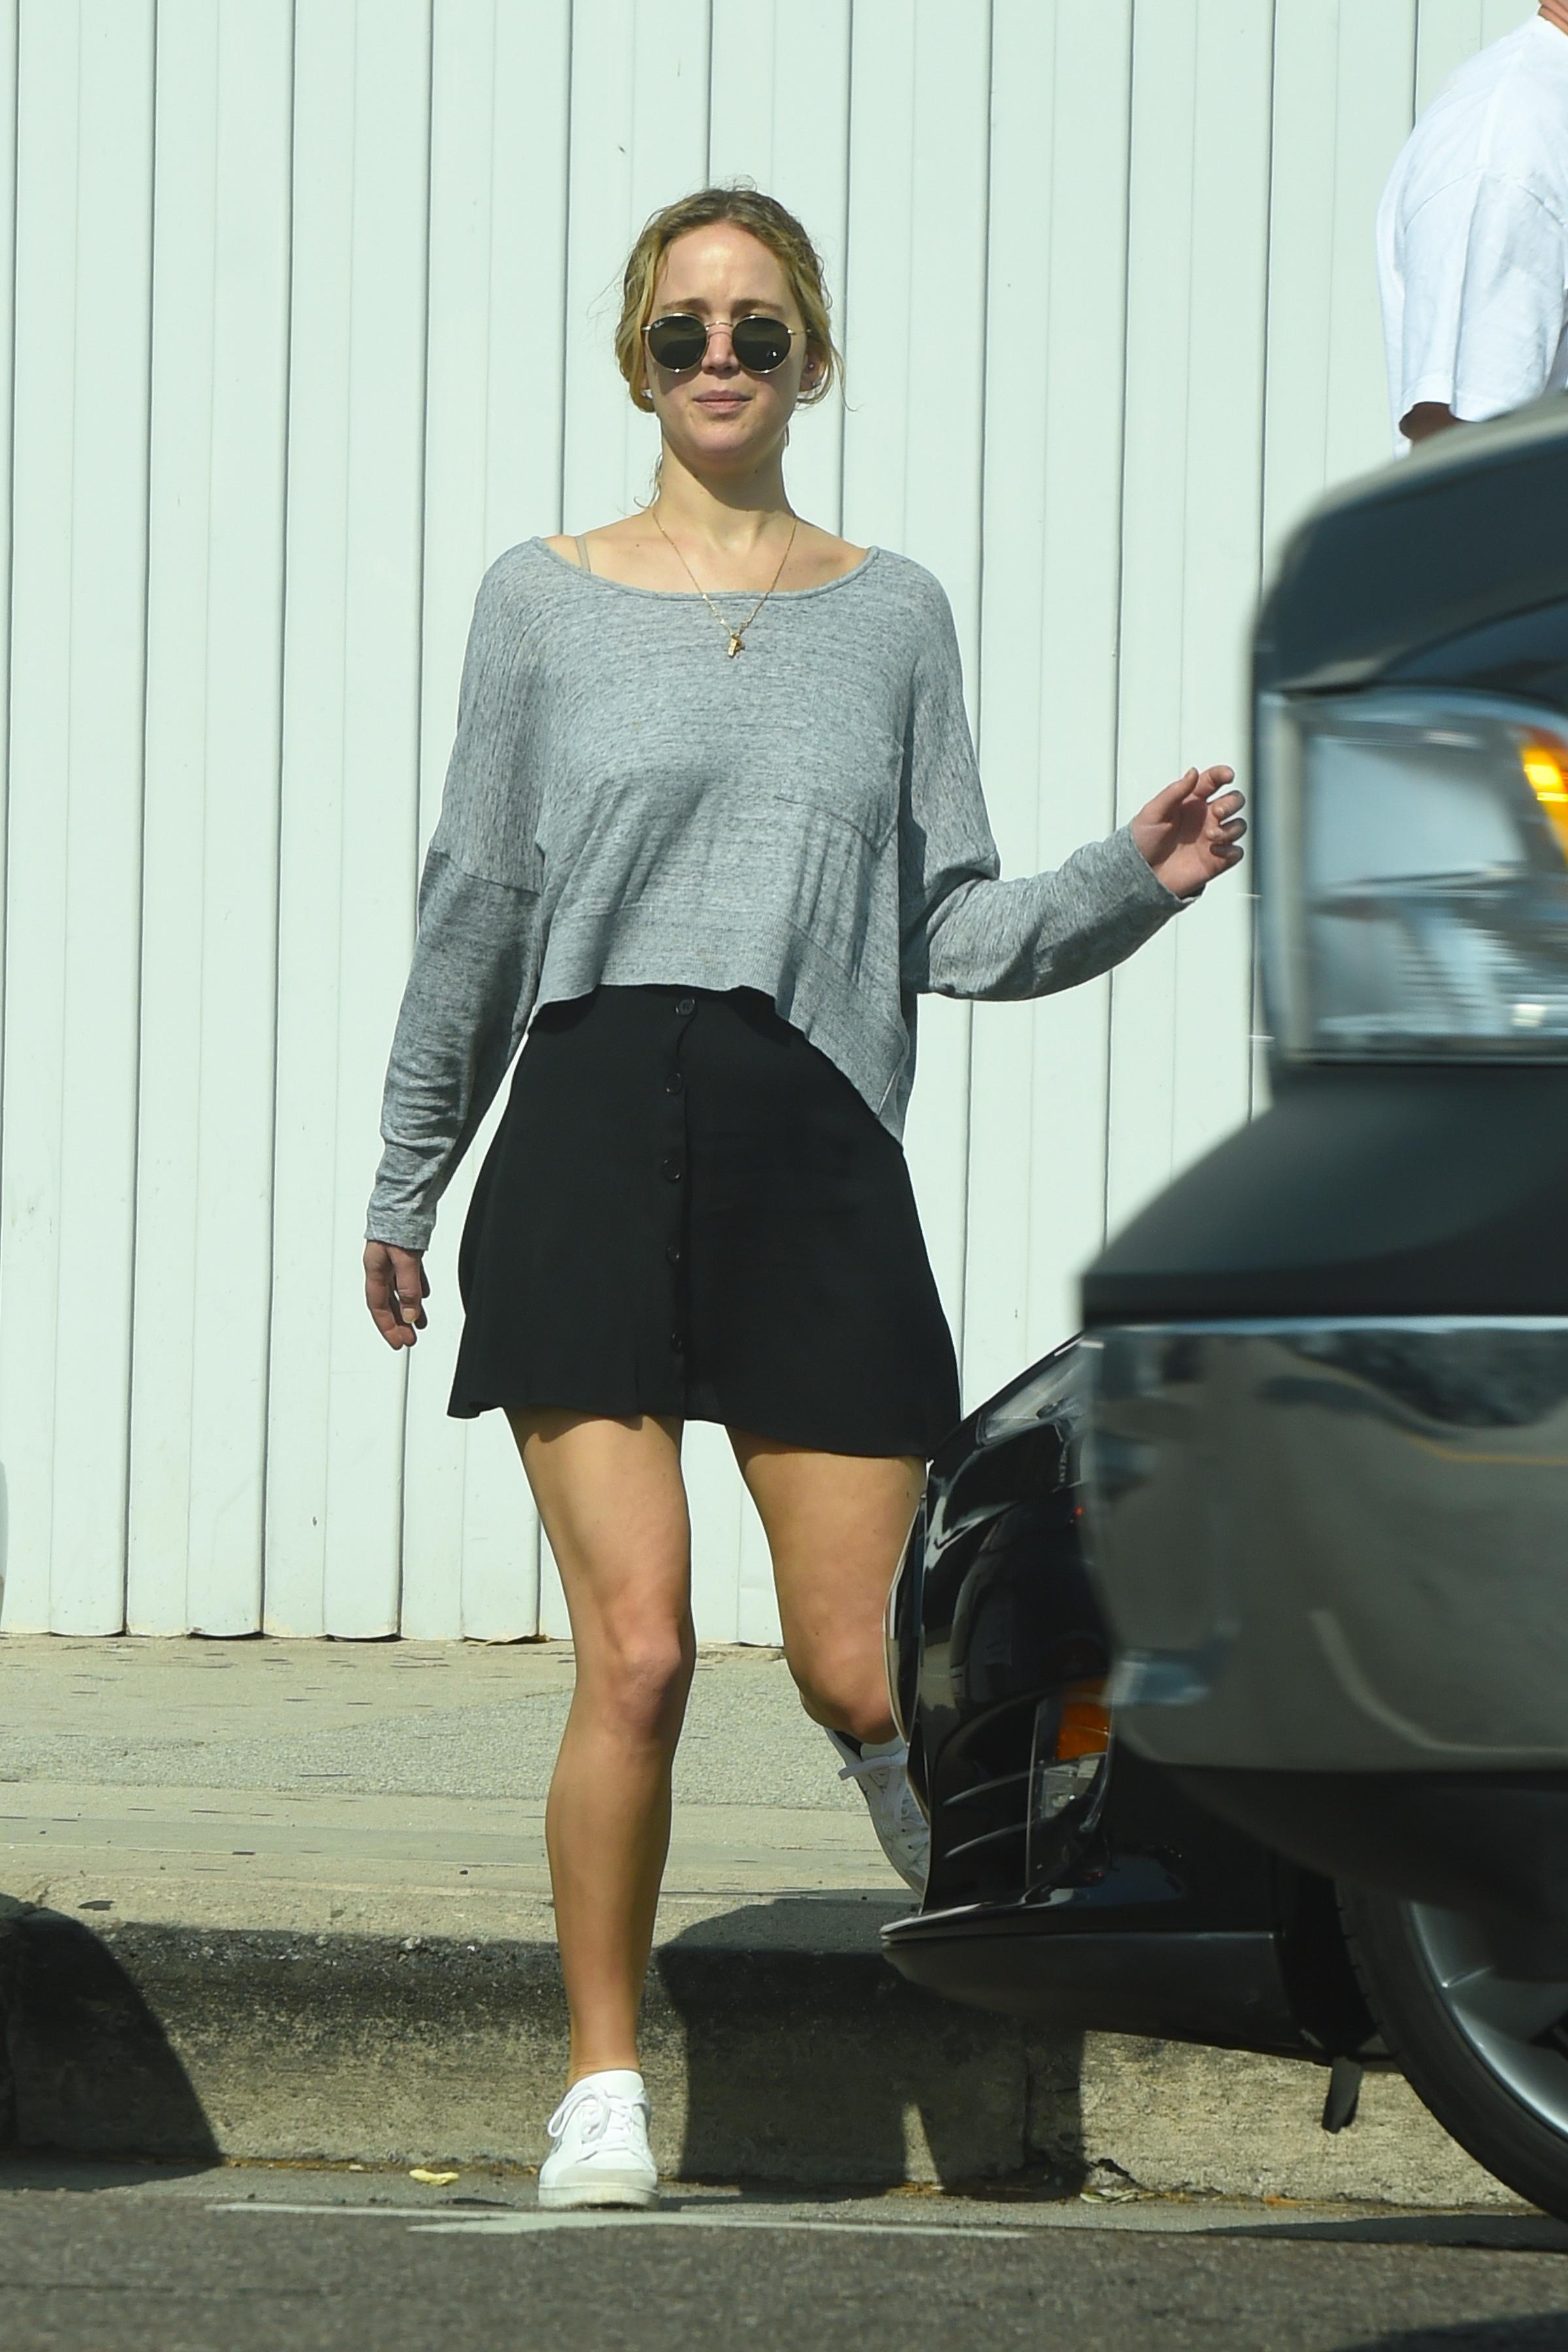 Jennifer Lawrence Hot girlfappening.com 1